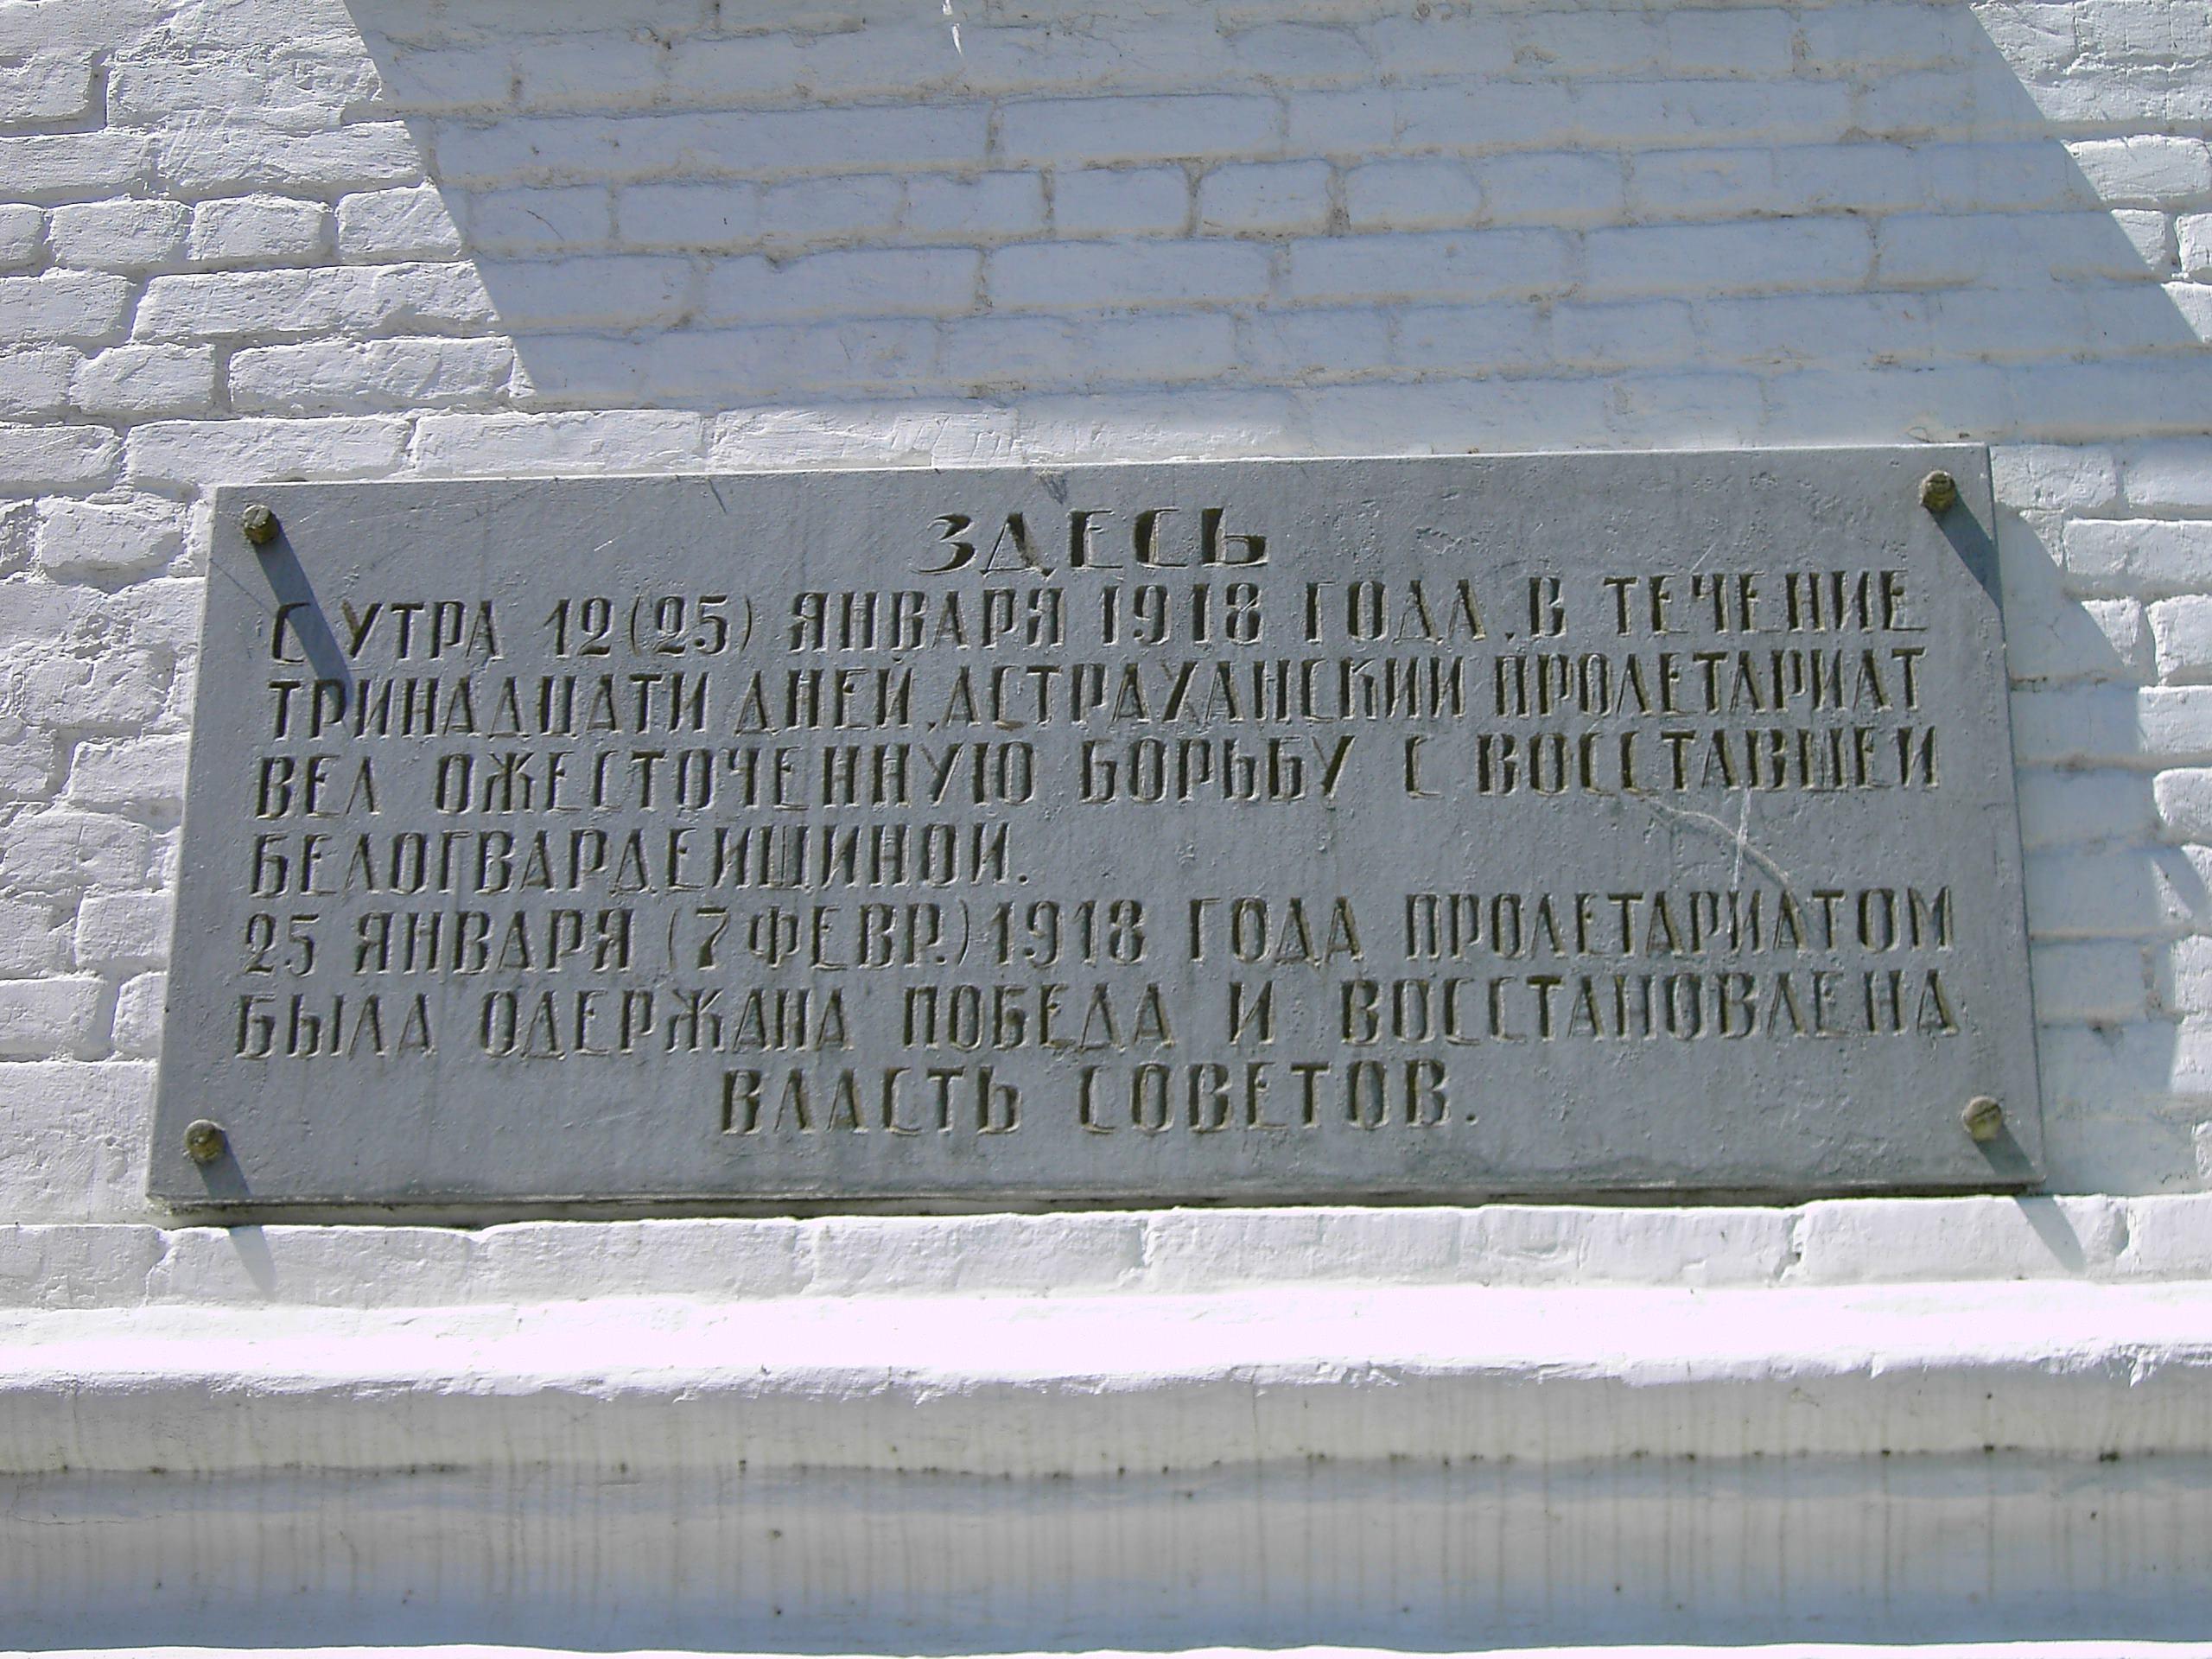 Табличка при входе 2 - г. Астрахань, Кремль